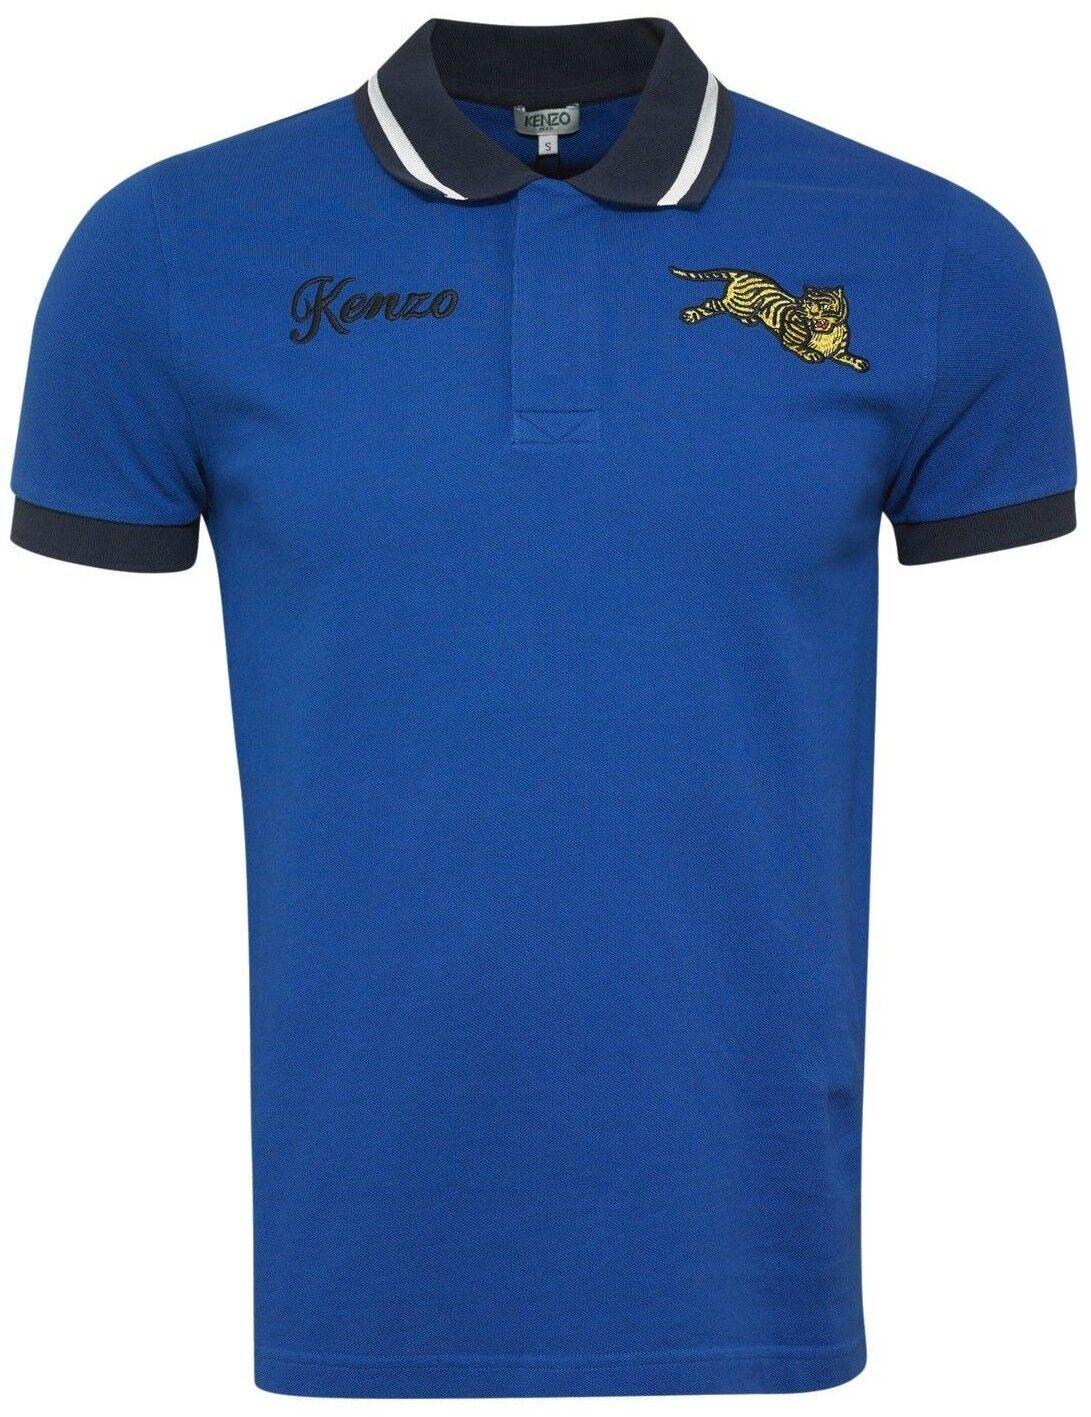 Kenzo Mens Jumping Tiger Motif Polo T-Shirt Royal bluee Icons K-Fit Large